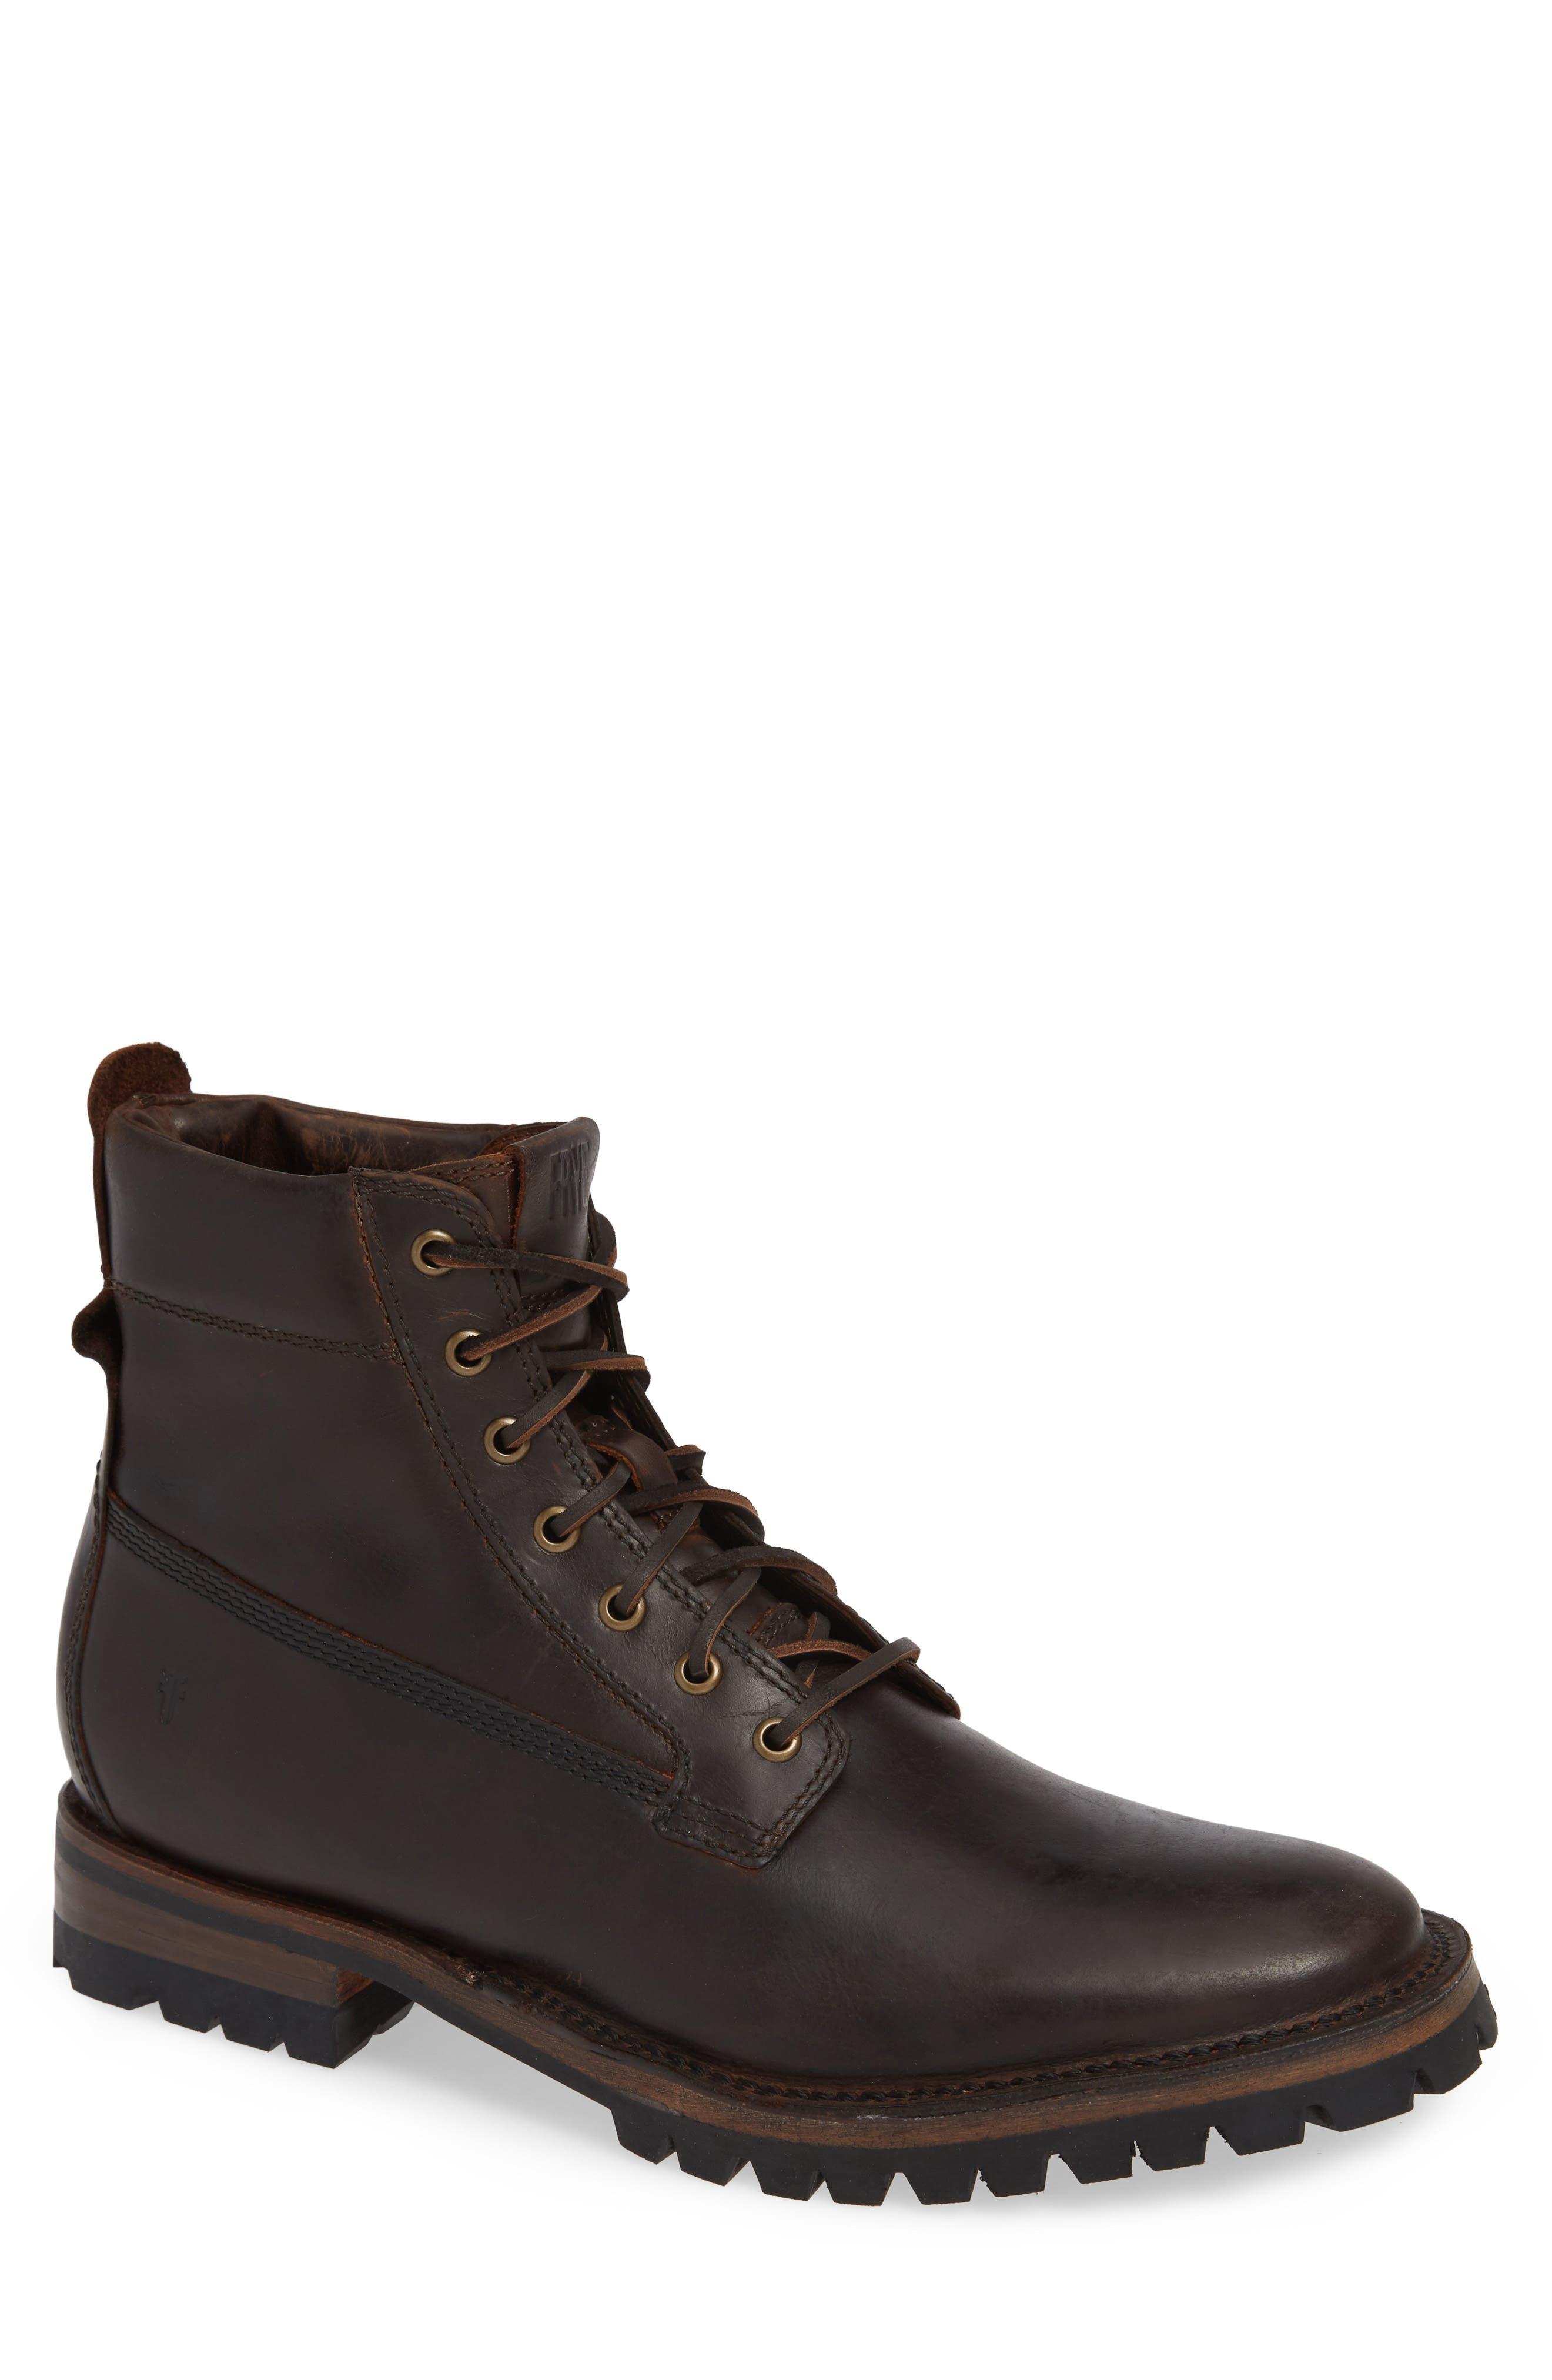 Union Plain Toe Boot,                         Main,                         color, DARK BROWN